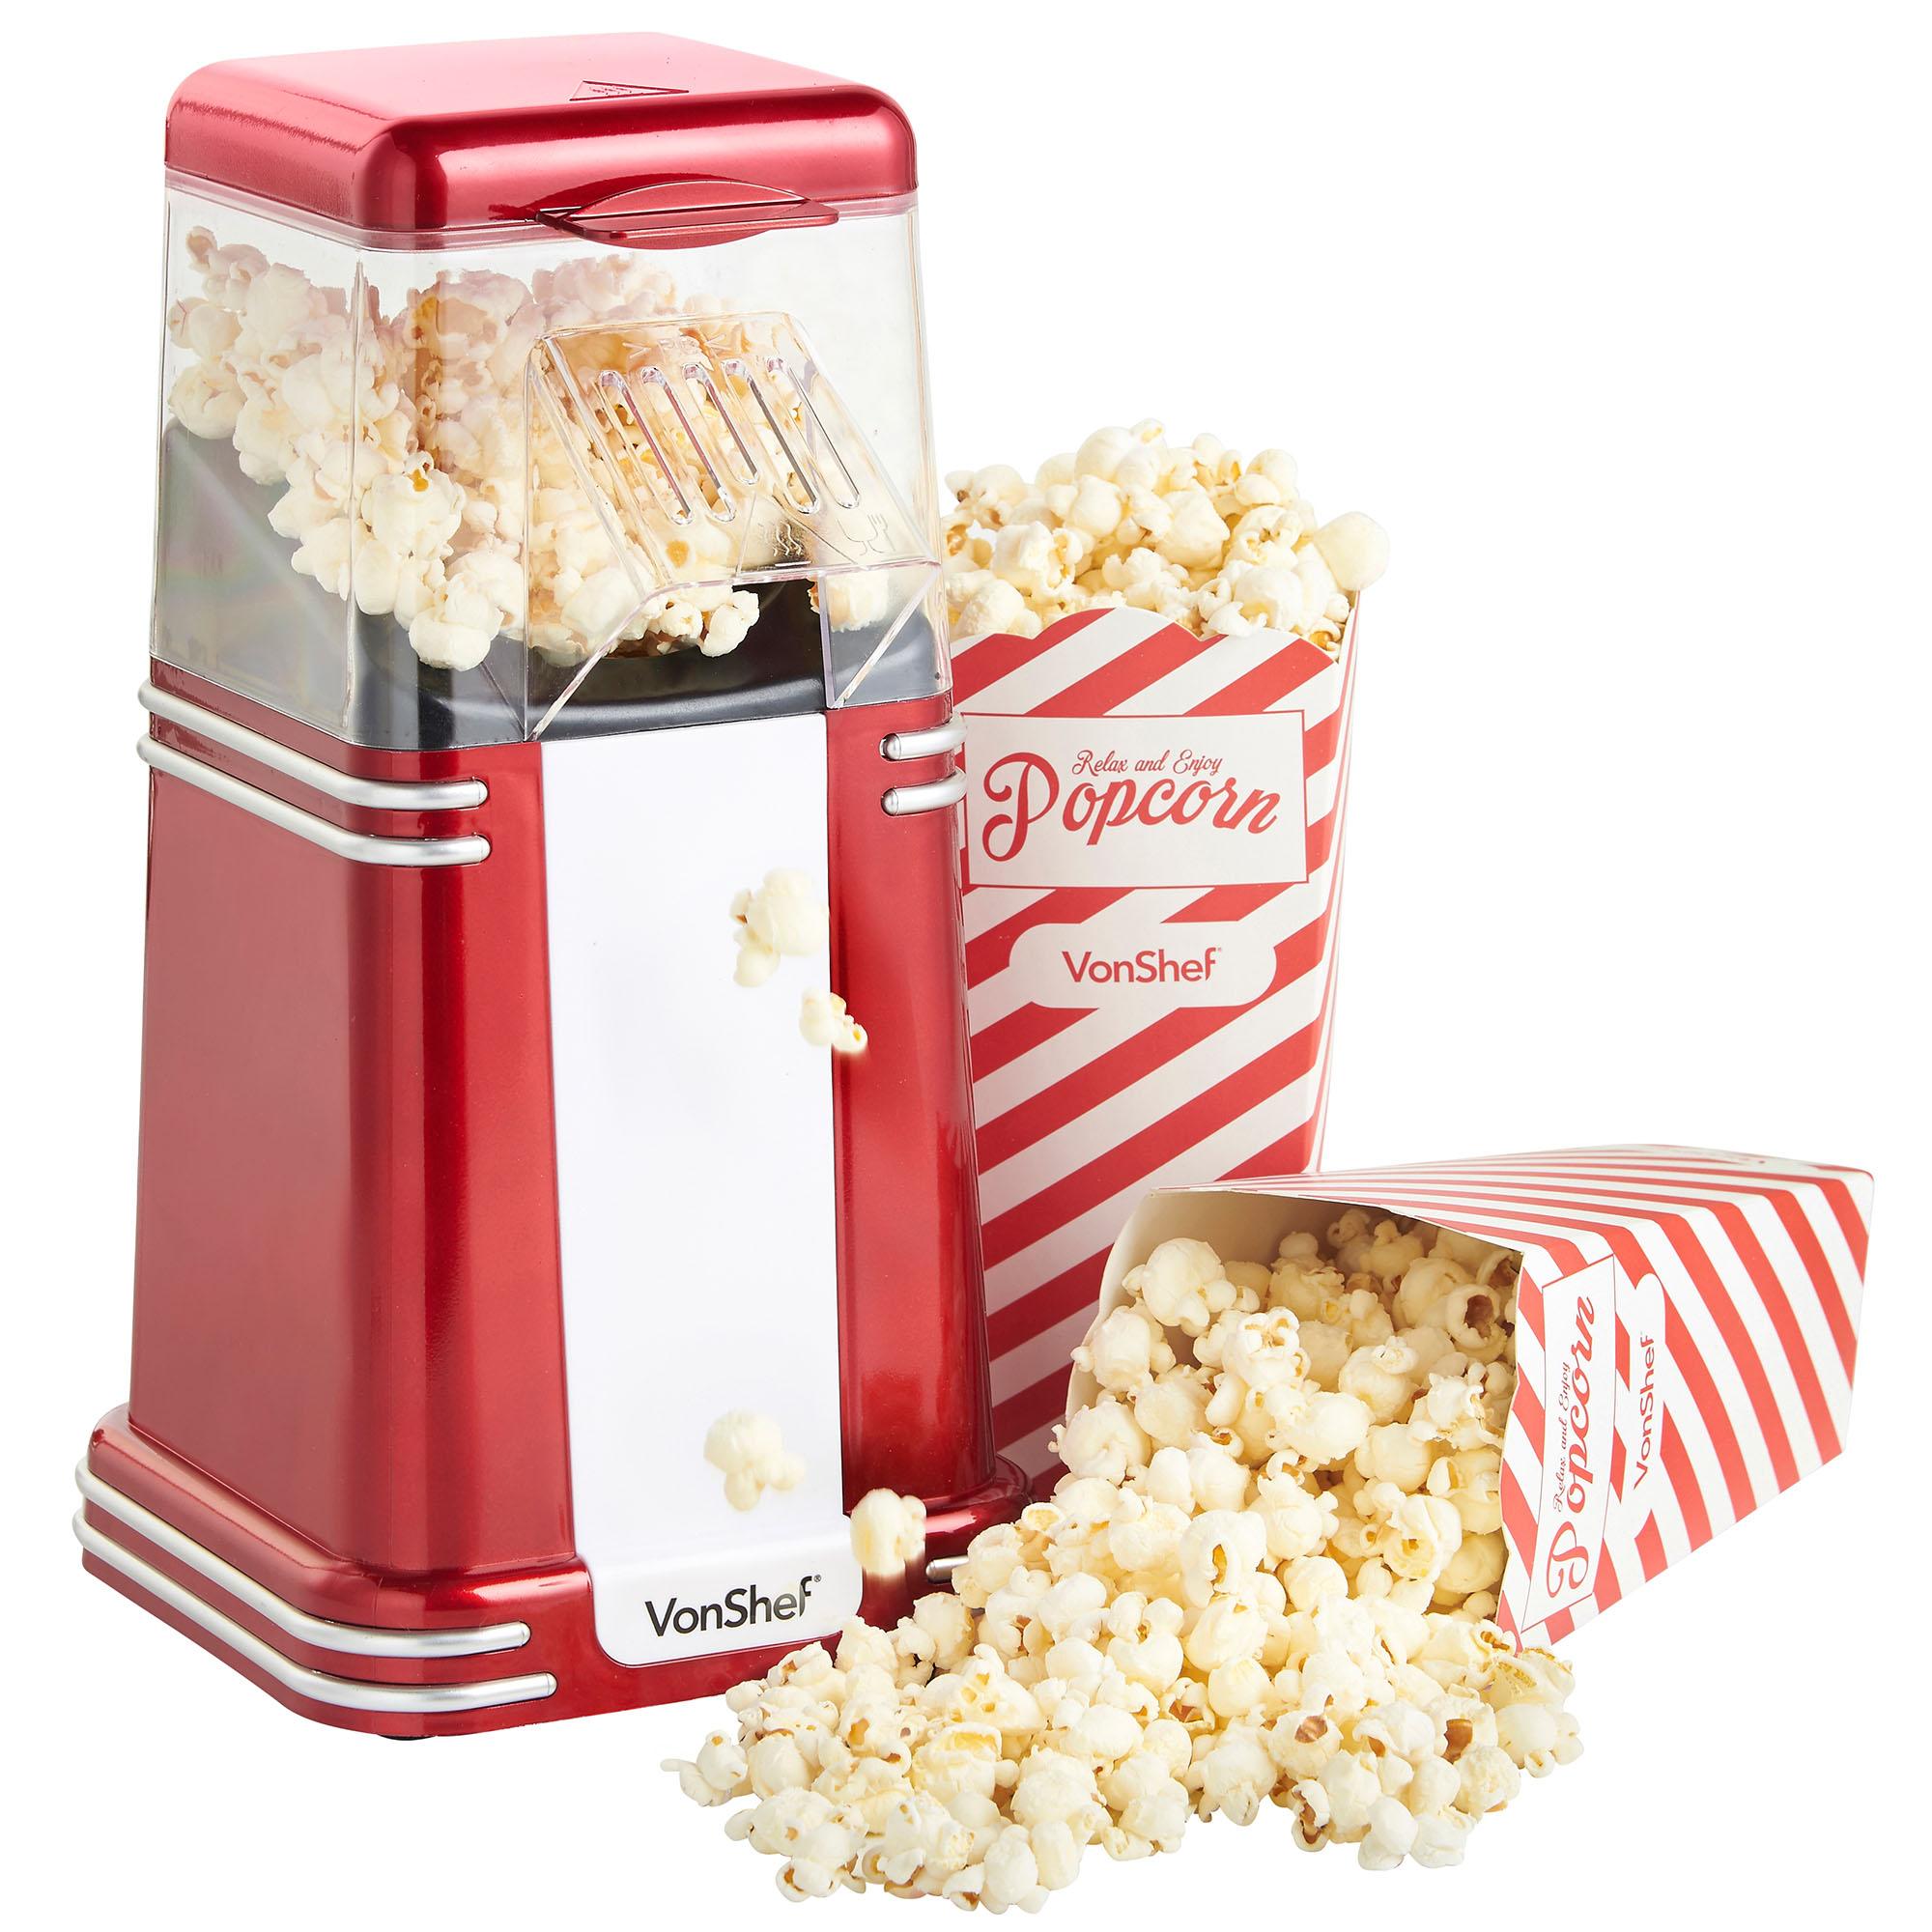 fashioned popcorn machine